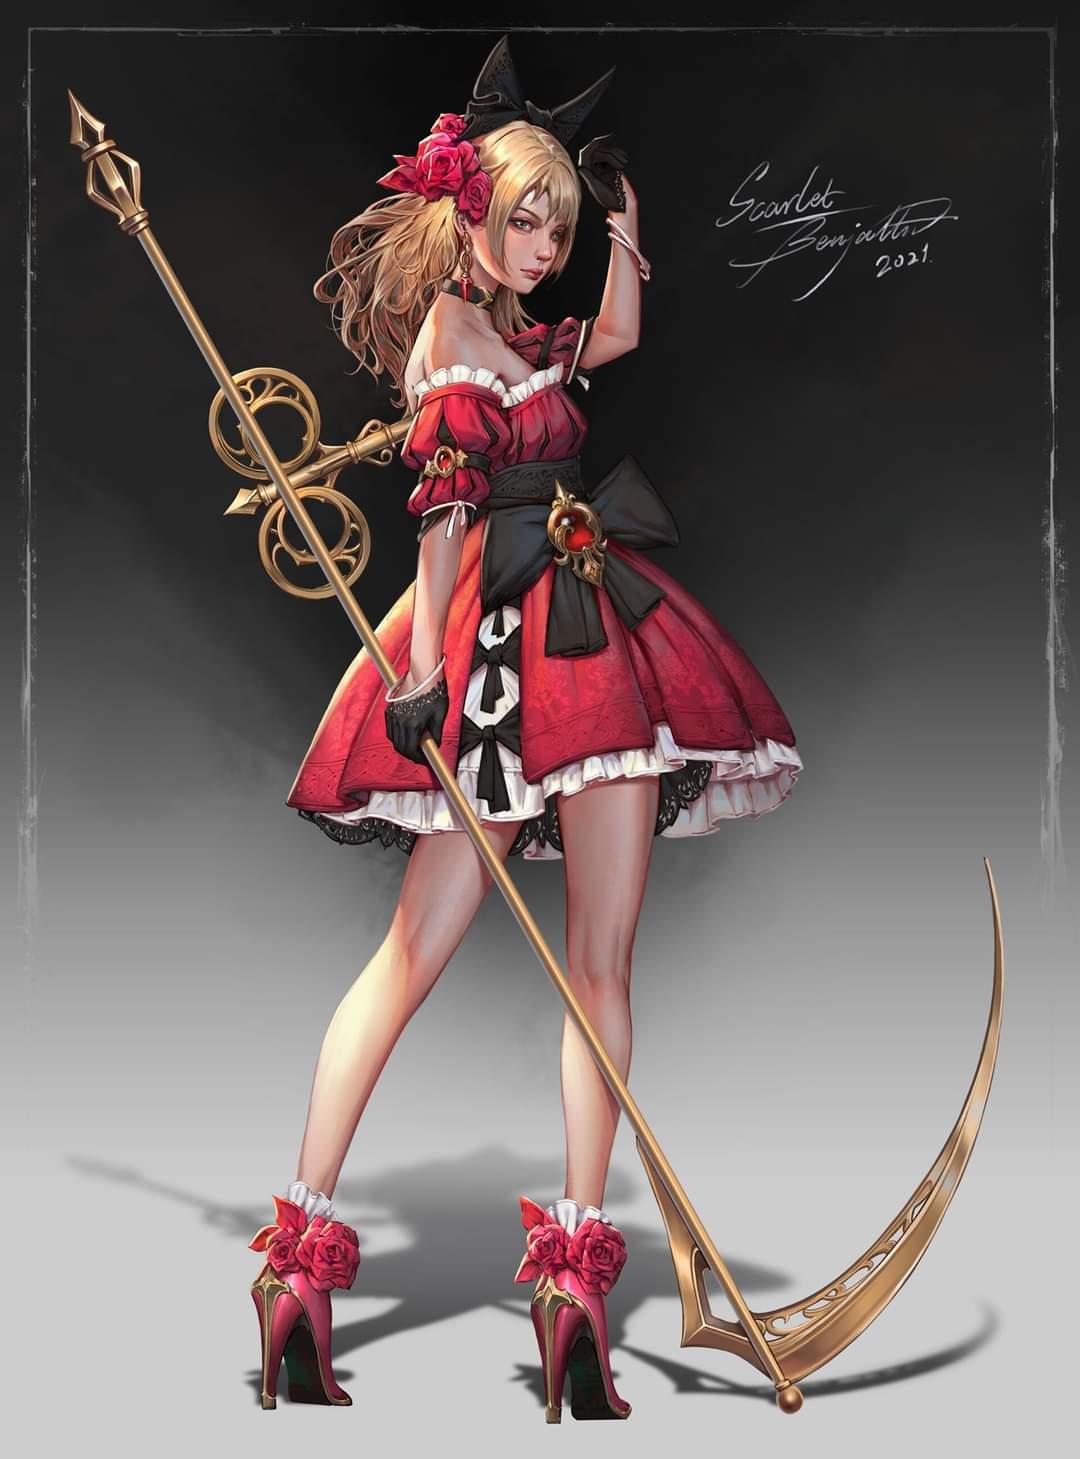 A steampunk clockwork doll girl named Scarlet by Wenmo Zhang